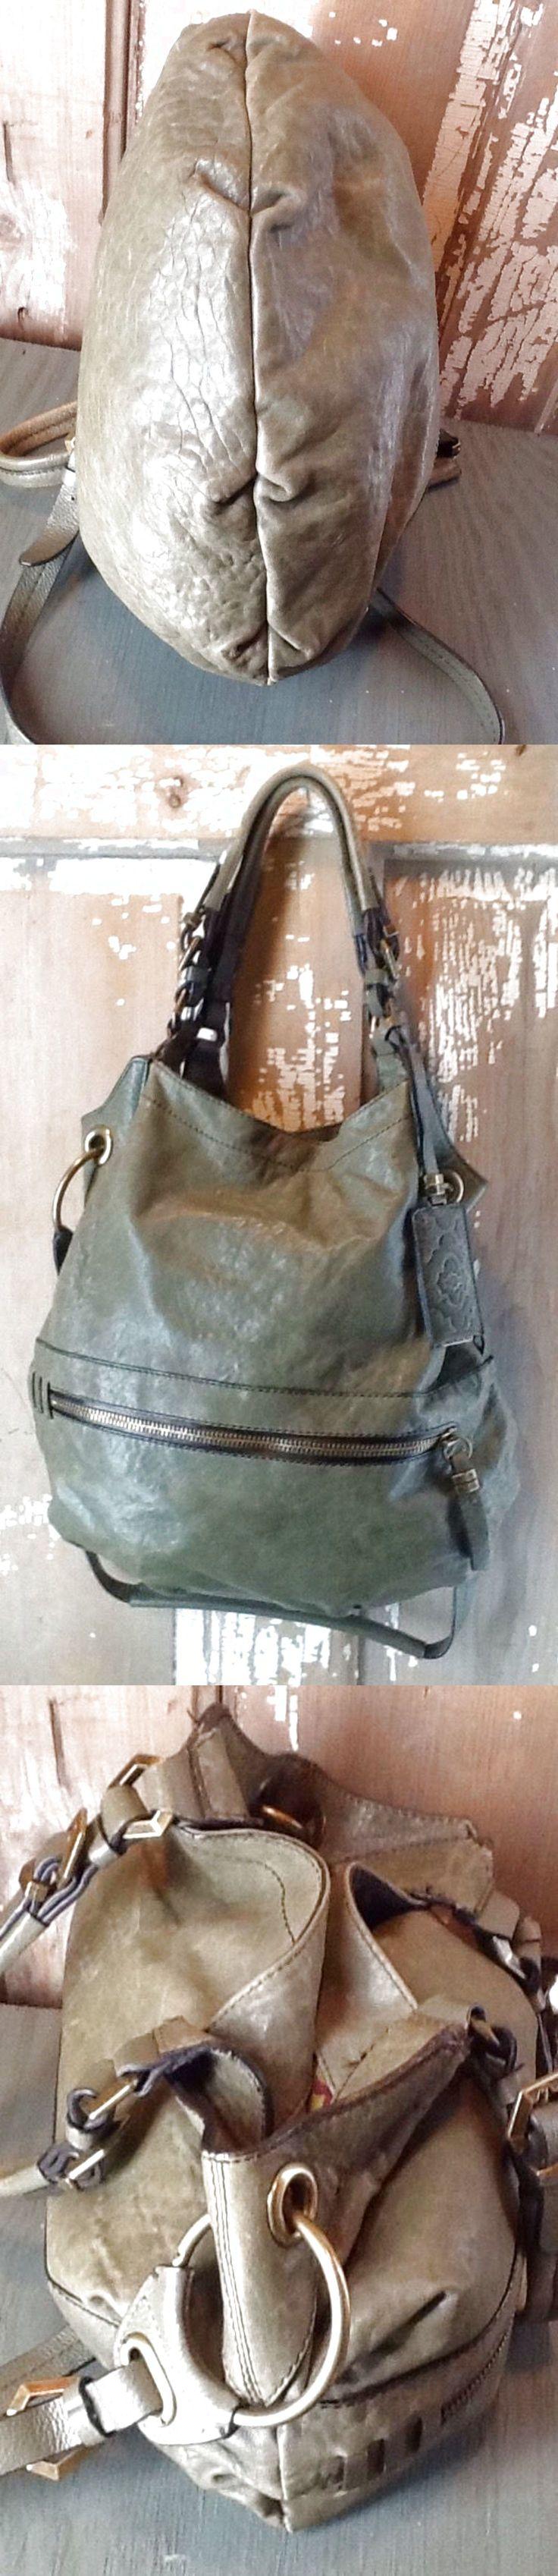 "OrYany Gorgeous Green Leather Hobo Bag H 15""X W16"" Sydney $50.0"